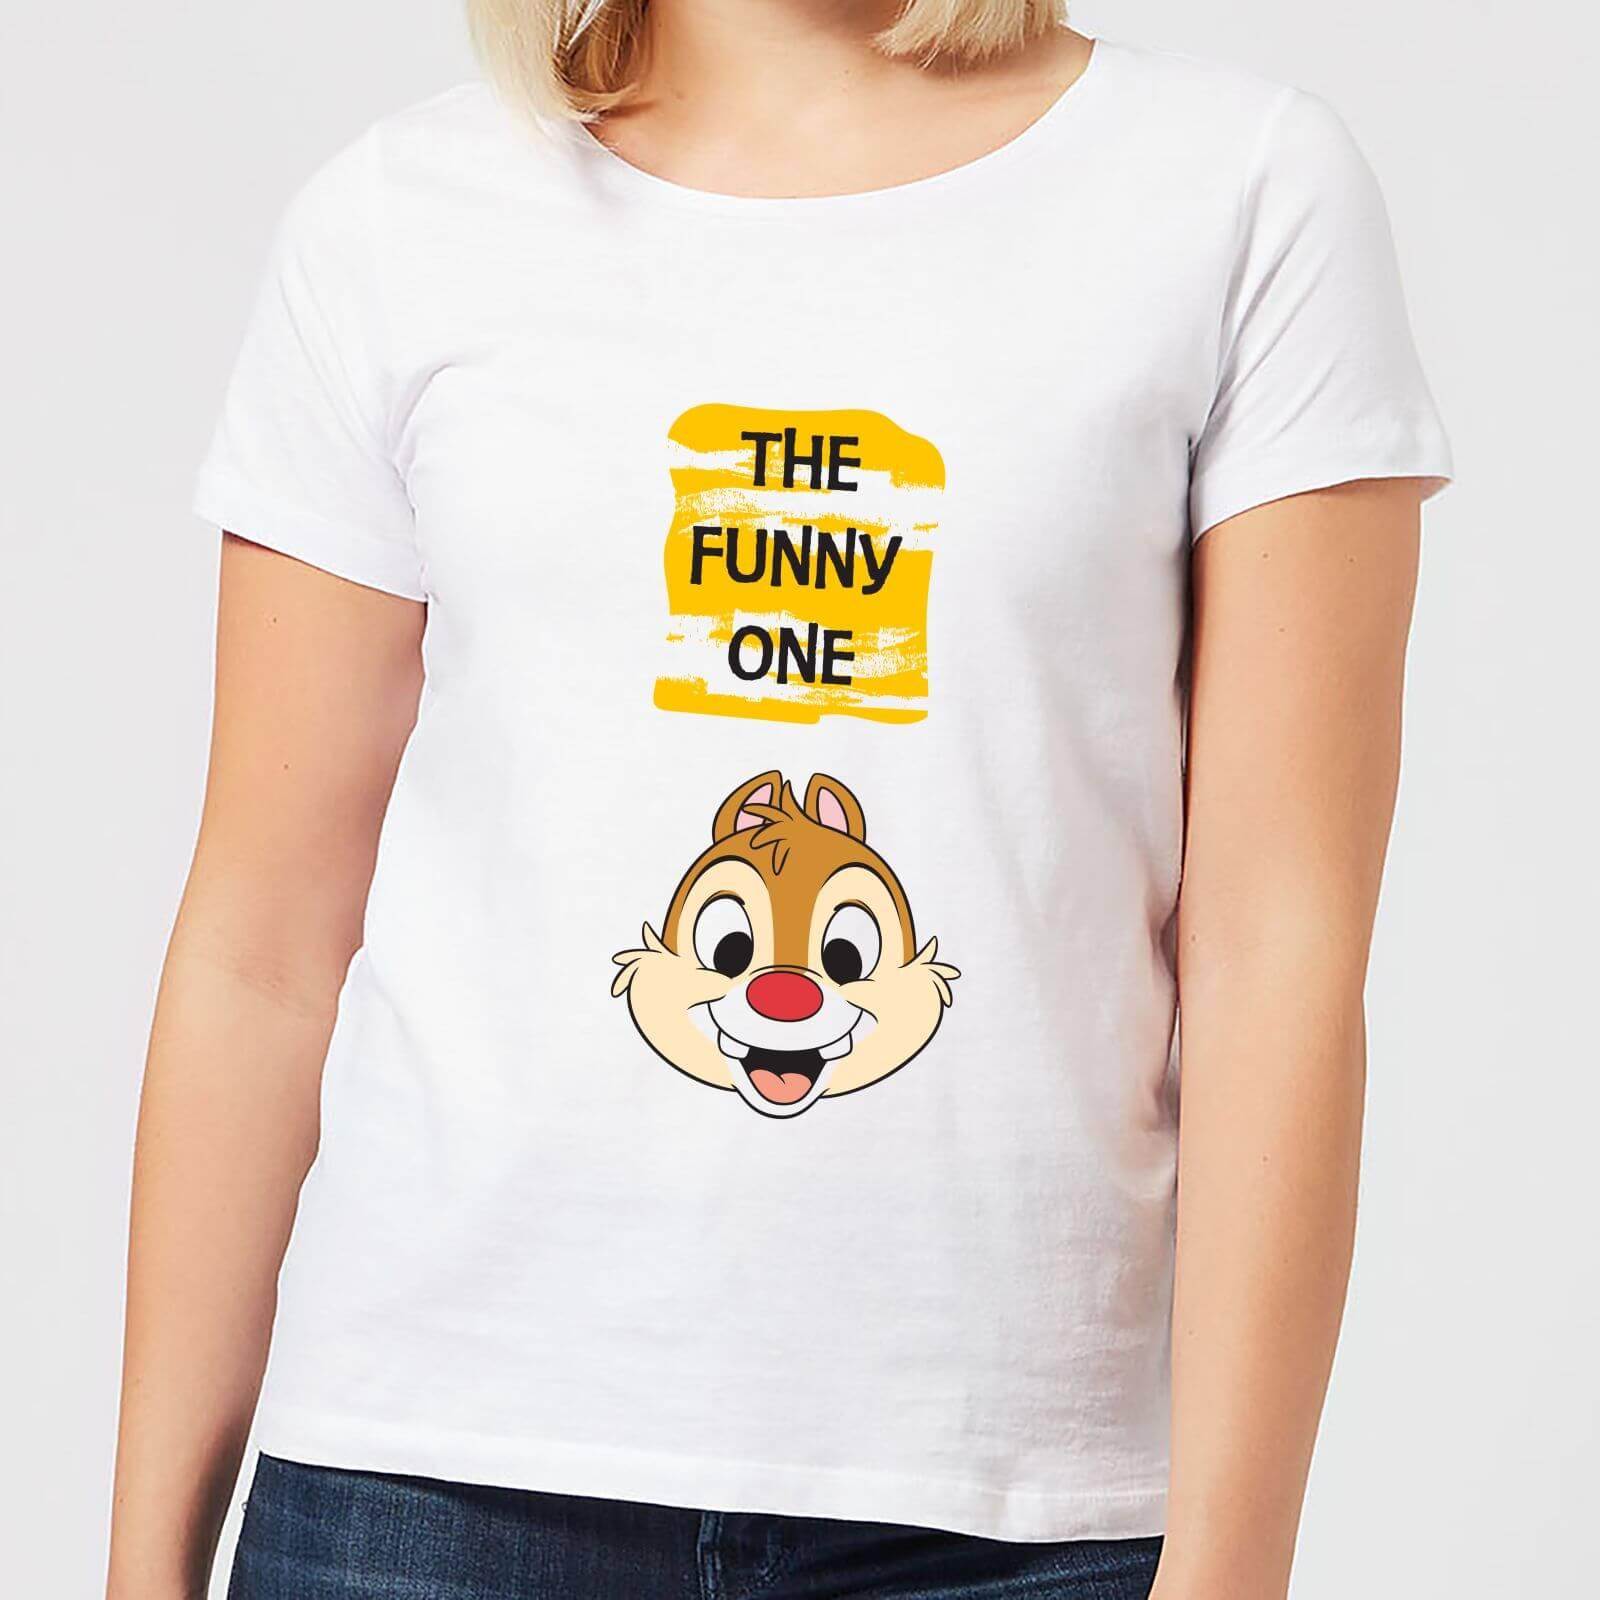 Disney Chip 'N' Dale The Funny One Women's T-Shirt - White - XXL - White